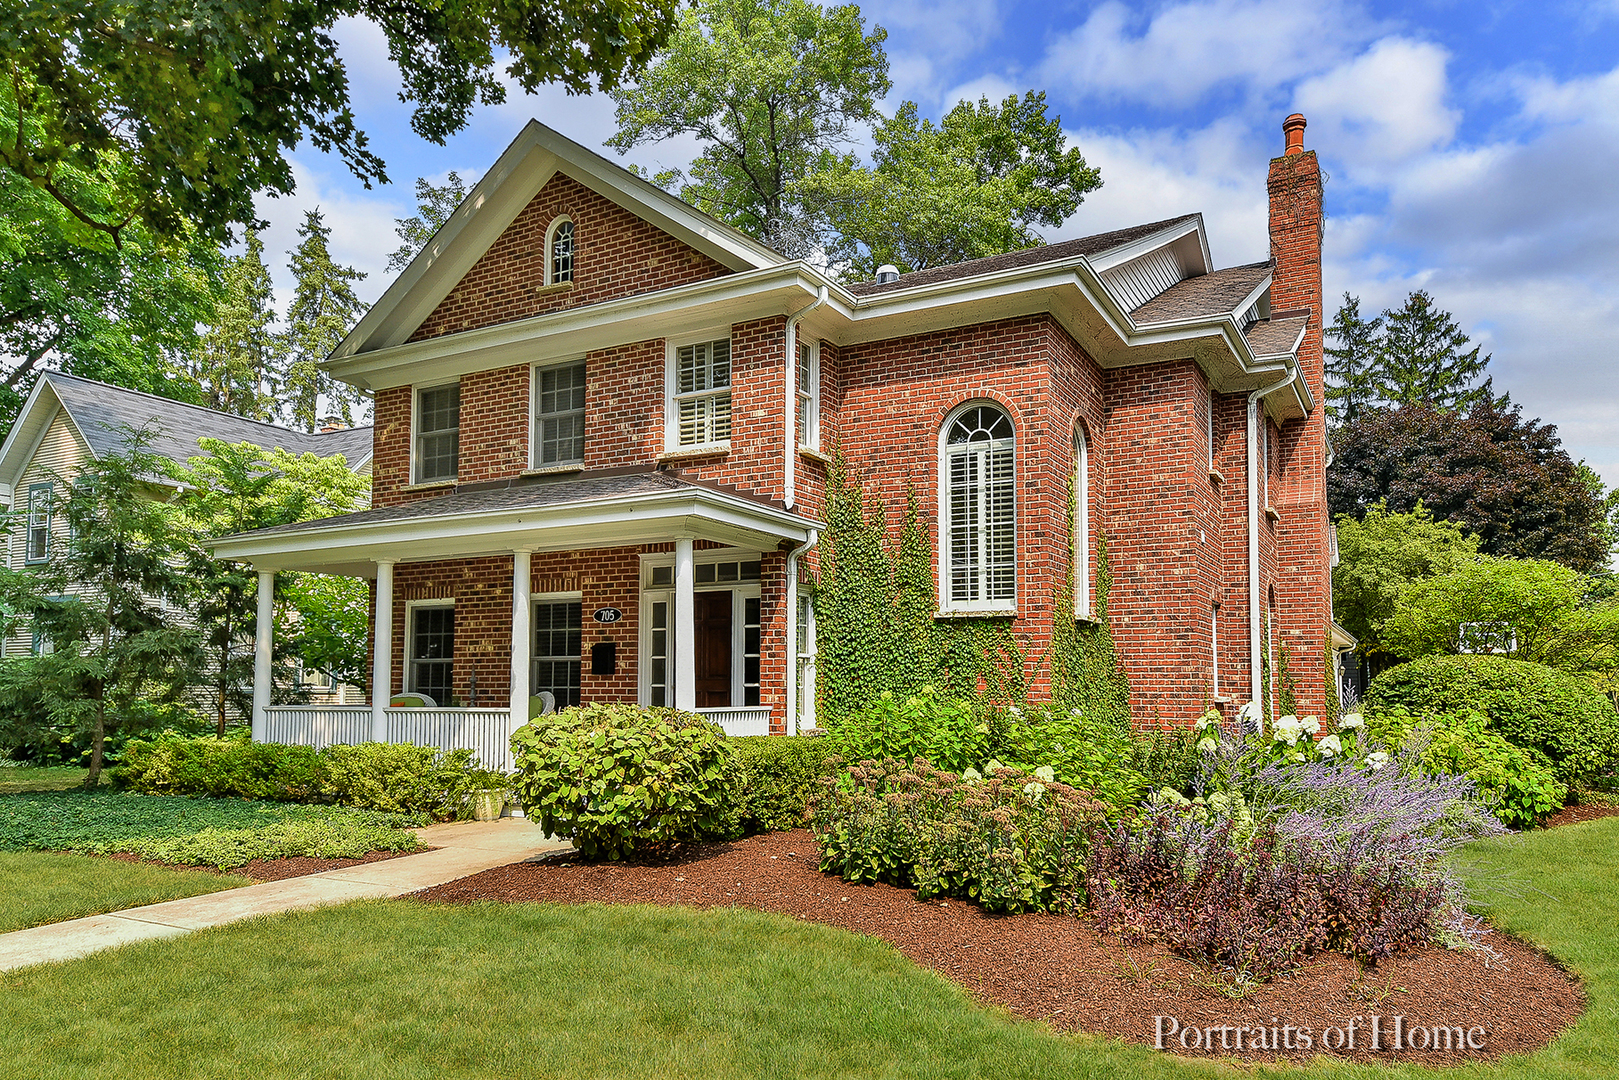 Ursula Foley, Foley Properties, Inc.